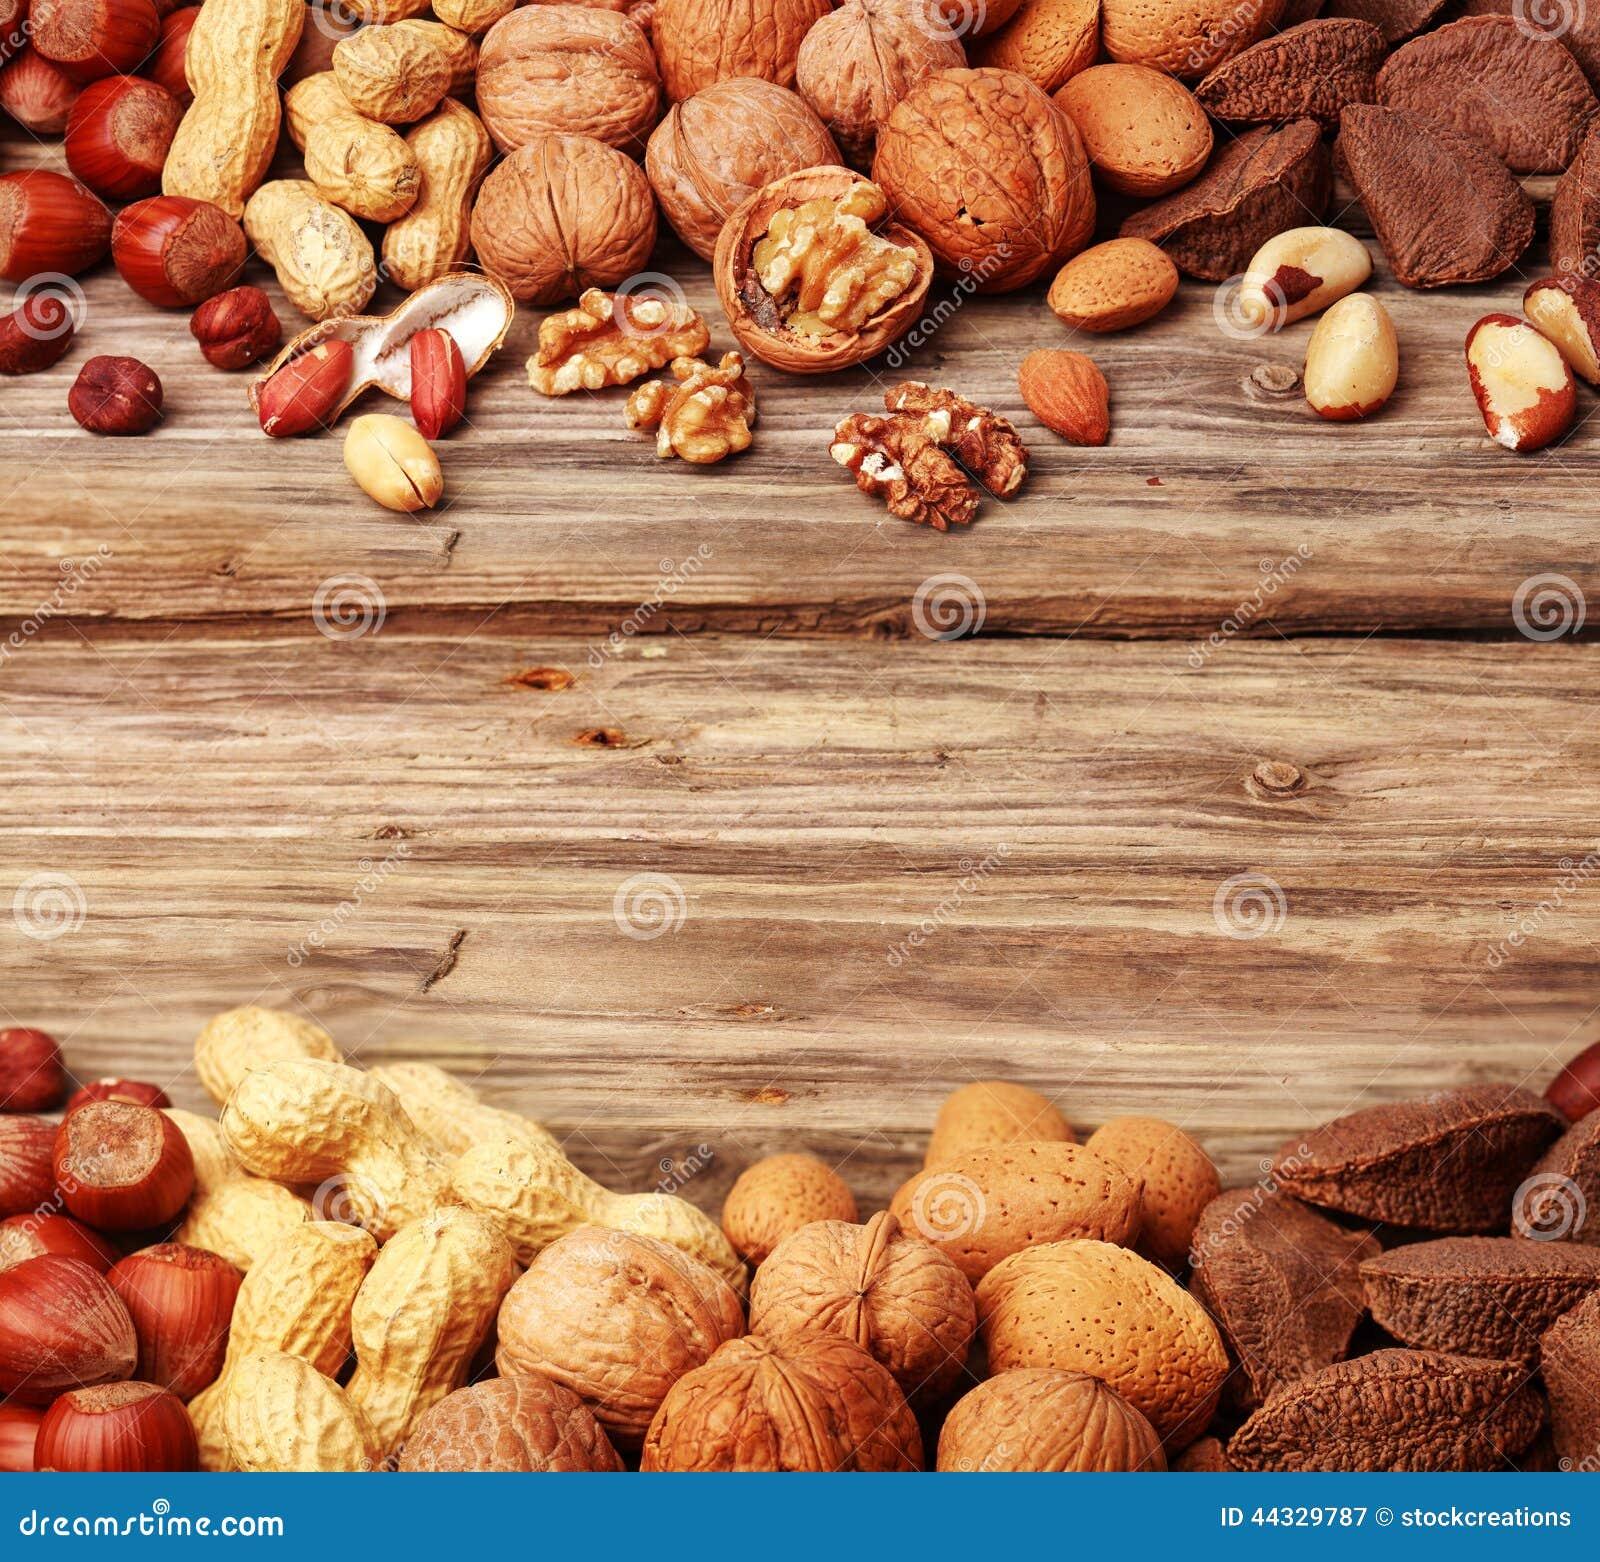 Are brazil nut shells radioactive dating 7